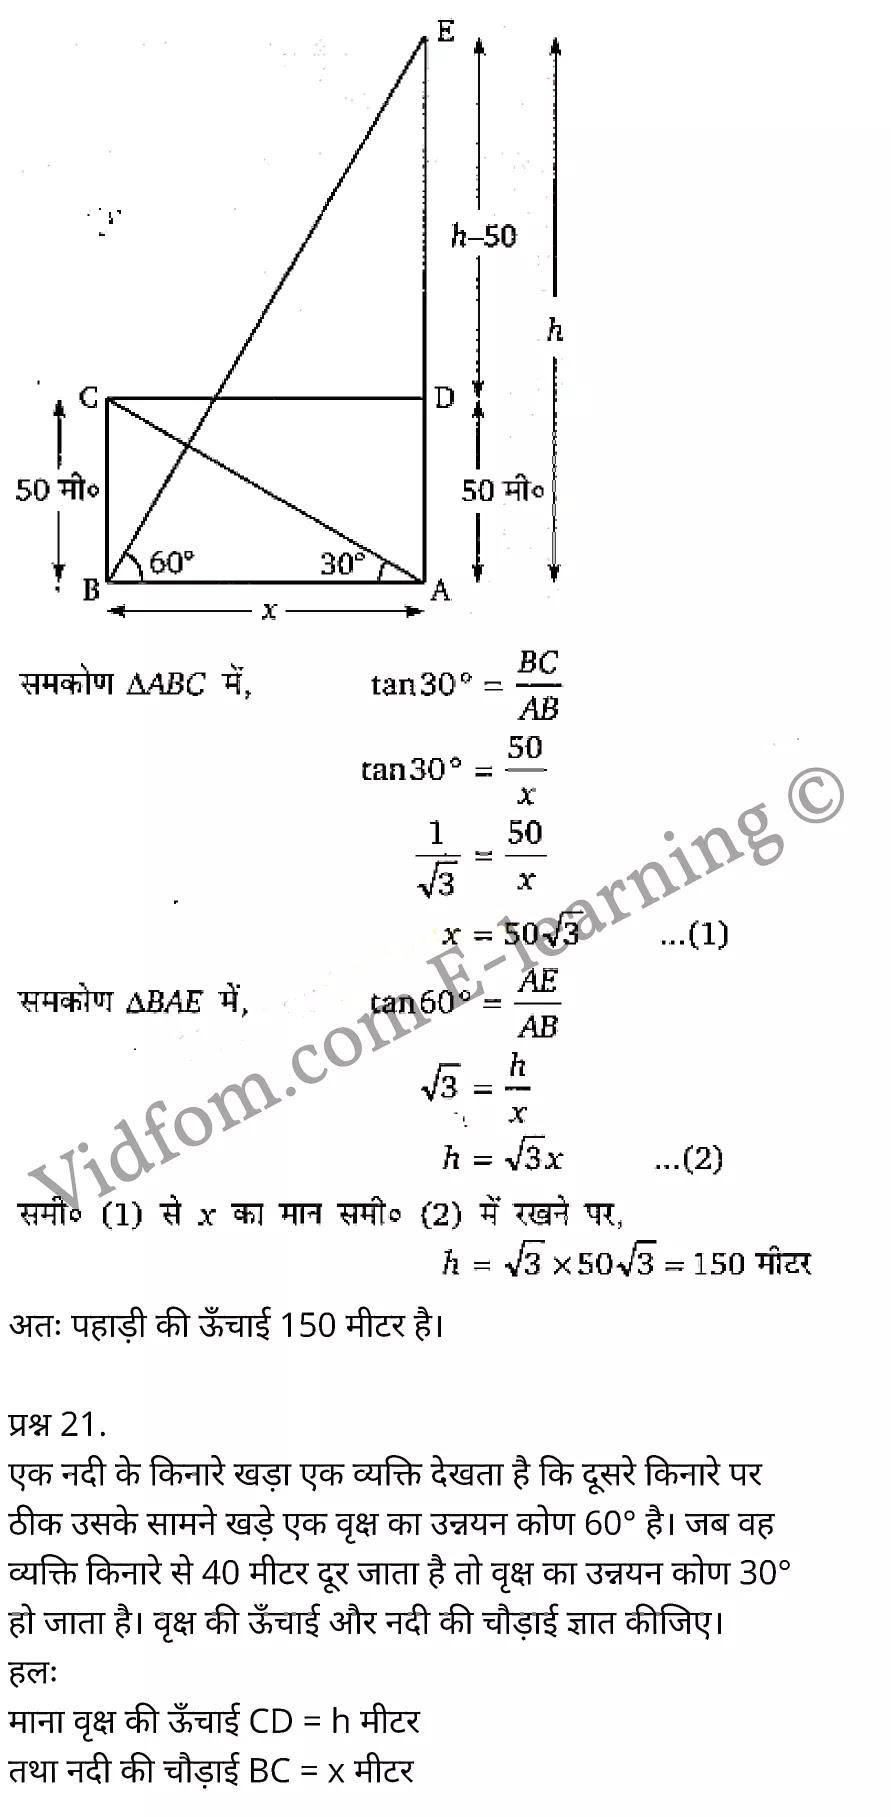 Chapter 11 Height and Distance Ex 11.1, Chapter 11 Height and Distance Ex 11.2, Chapter 11 Height and Distance Ex 11.3, कक्षा 10 बालाजी गणित  के नोट्स  हिंदी में एनसीईआरटी समाधान,     class 10 Balaji Maths Chapter 11,   class 10 Balaji Maths Chapter 11 ncert solutions in Hindi,   class 10 Balaji Maths Chapter 11 notes in hindi,   class 10 Balaji Maths Chapter 11 question answer,   class 10 Balaji Maths Chapter 11 notes,   class 10 Balaji Maths Chapter 11 class 10 Balaji Maths Chapter 11 in  hindi,    class 10 Balaji Maths Chapter 11 important questions in  hindi,   class 10 Balaji Maths Chapter 11 notes in hindi,    class 10 Balaji Maths Chapter 11 test,   class 10 Balaji Maths Chapter 11 pdf,   class 10 Balaji Maths Chapter 11 notes pdf,   class 10 Balaji Maths Chapter 11 exercise solutions,   class 10 Balaji Maths Chapter 11 notes study rankers,   class 10 Balaji Maths Chapter 11 notes,    class 10 Balaji Maths Chapter 11  class 10  notes pdf,   class 10 Balaji Maths Chapter 11 class 10  notes  ncert,   class 10 Balaji Maths Chapter 11 class 10 pdf,   class 10 Balaji Maths Chapter 11  book,   class 10 Balaji Maths Chapter 11 quiz class 10  ,    10  th class 10 Balaji Maths Chapter 11  book up board,   up board 10  th class 10 Balaji Maths Chapter 11 notes,  class 10 Balaji Maths,   class 10 Balaji Maths ncert solutions in Hindi,   class 10 Balaji Maths notes in hindi,   class 10 Balaji Maths question answer,   class 10 Balaji Maths notes,  class 10 Balaji Maths class 10 Balaji Maths Chapter 11 in  hindi,    class 10 Balaji Maths important questions in  hindi,   class 10 Balaji Maths notes in hindi,    class 10 Balaji Maths test,  class 10 Balaji Maths class 10 Balaji Maths Chapter 11 pdf,   class 10 Balaji Maths notes pdf,   class 10 Balaji Maths exercise solutions,   class 10 Balaji Maths,  class 10 Balaji Maths notes study rankers,   class 10 Balaji Maths notes,  class 10 Balaji Maths notes,   class 10 Balaji Maths  class 10  notes pdf,   class 10 Balaji Maths c